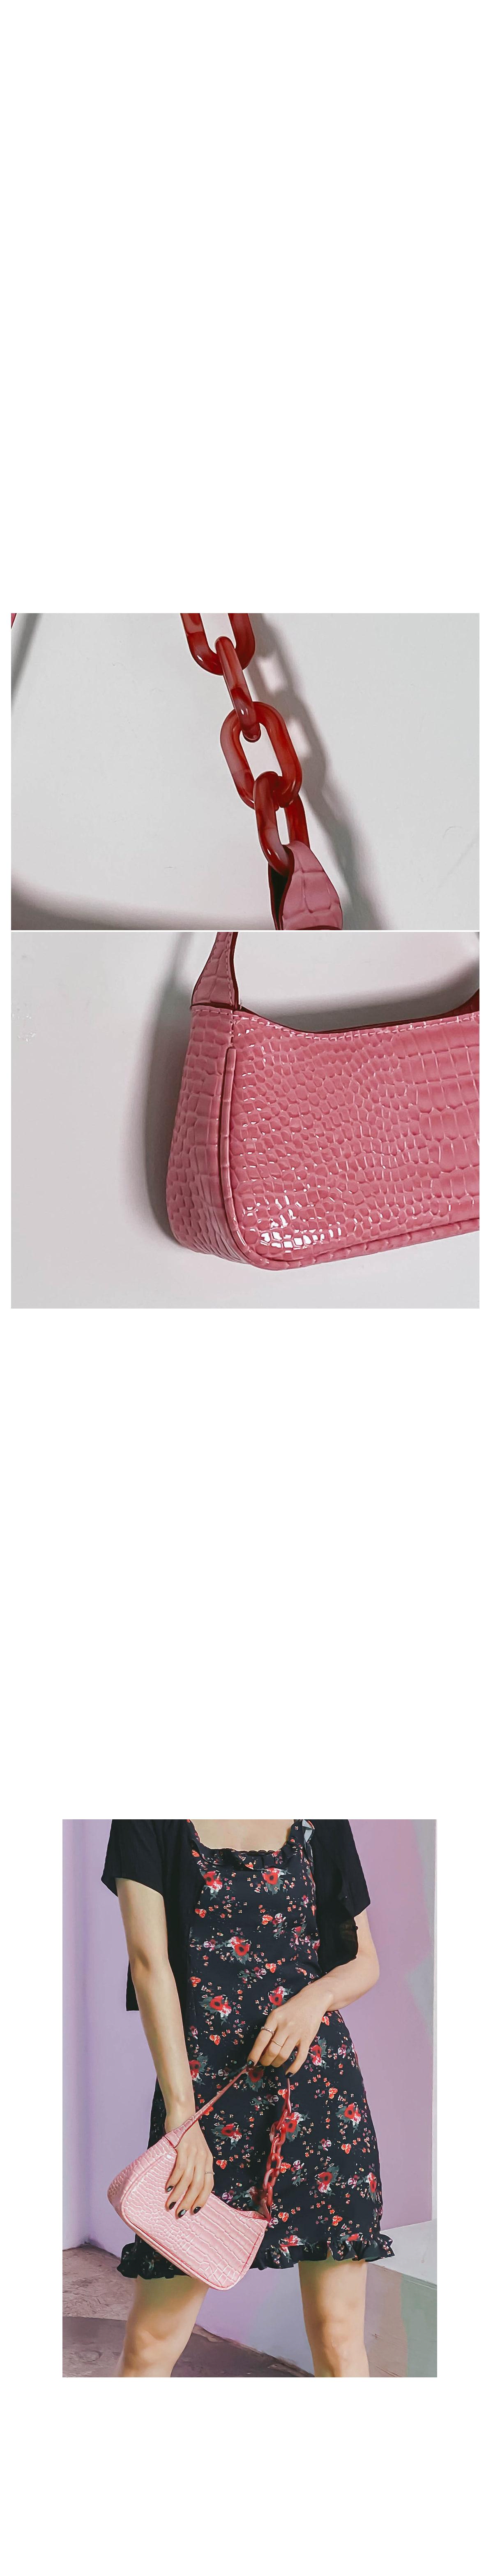 Mini chain shoulder bag